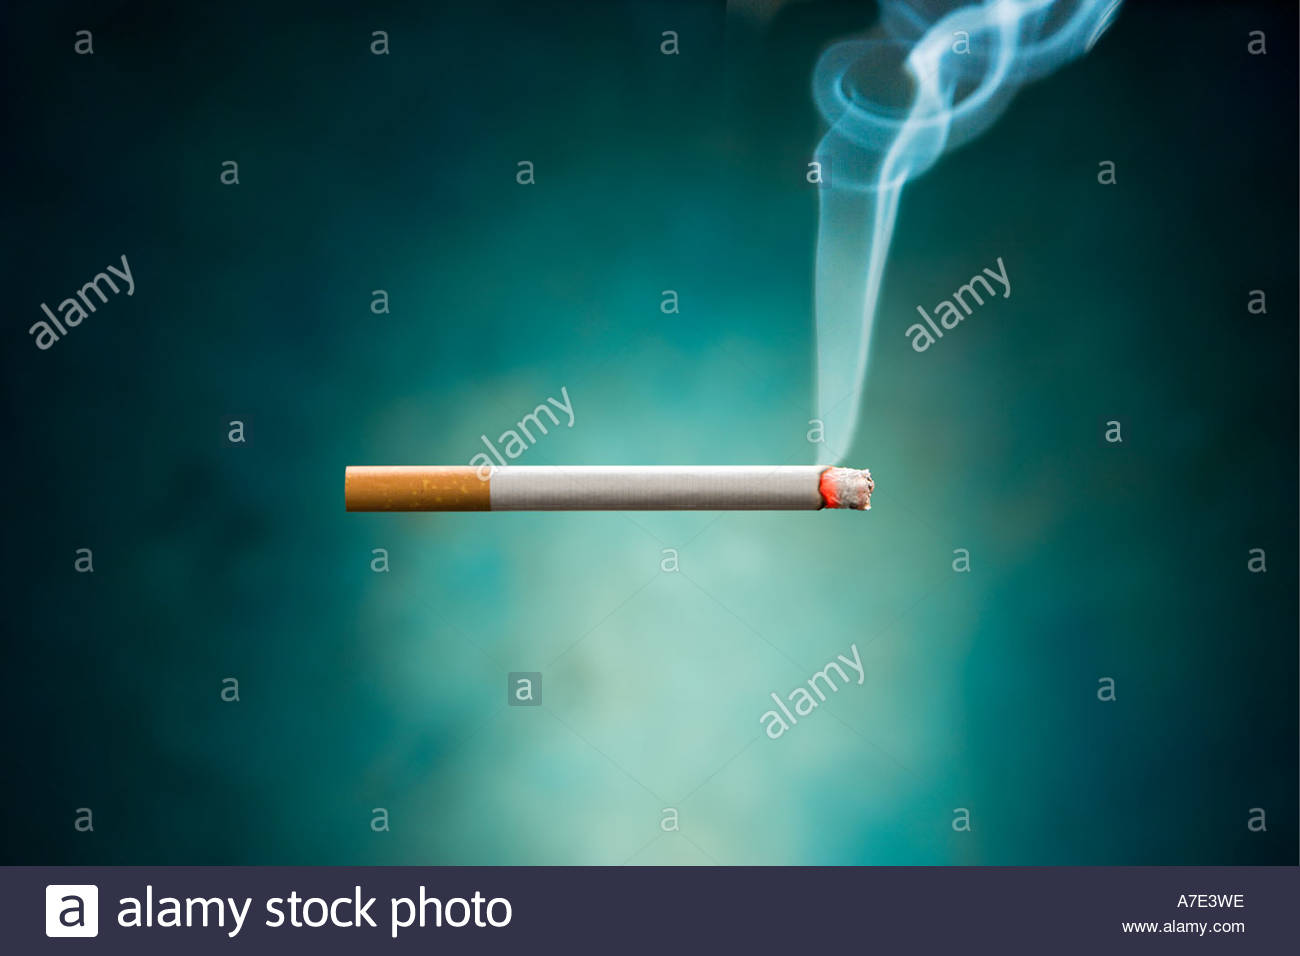 Smoking Cigarette. - Stock Image